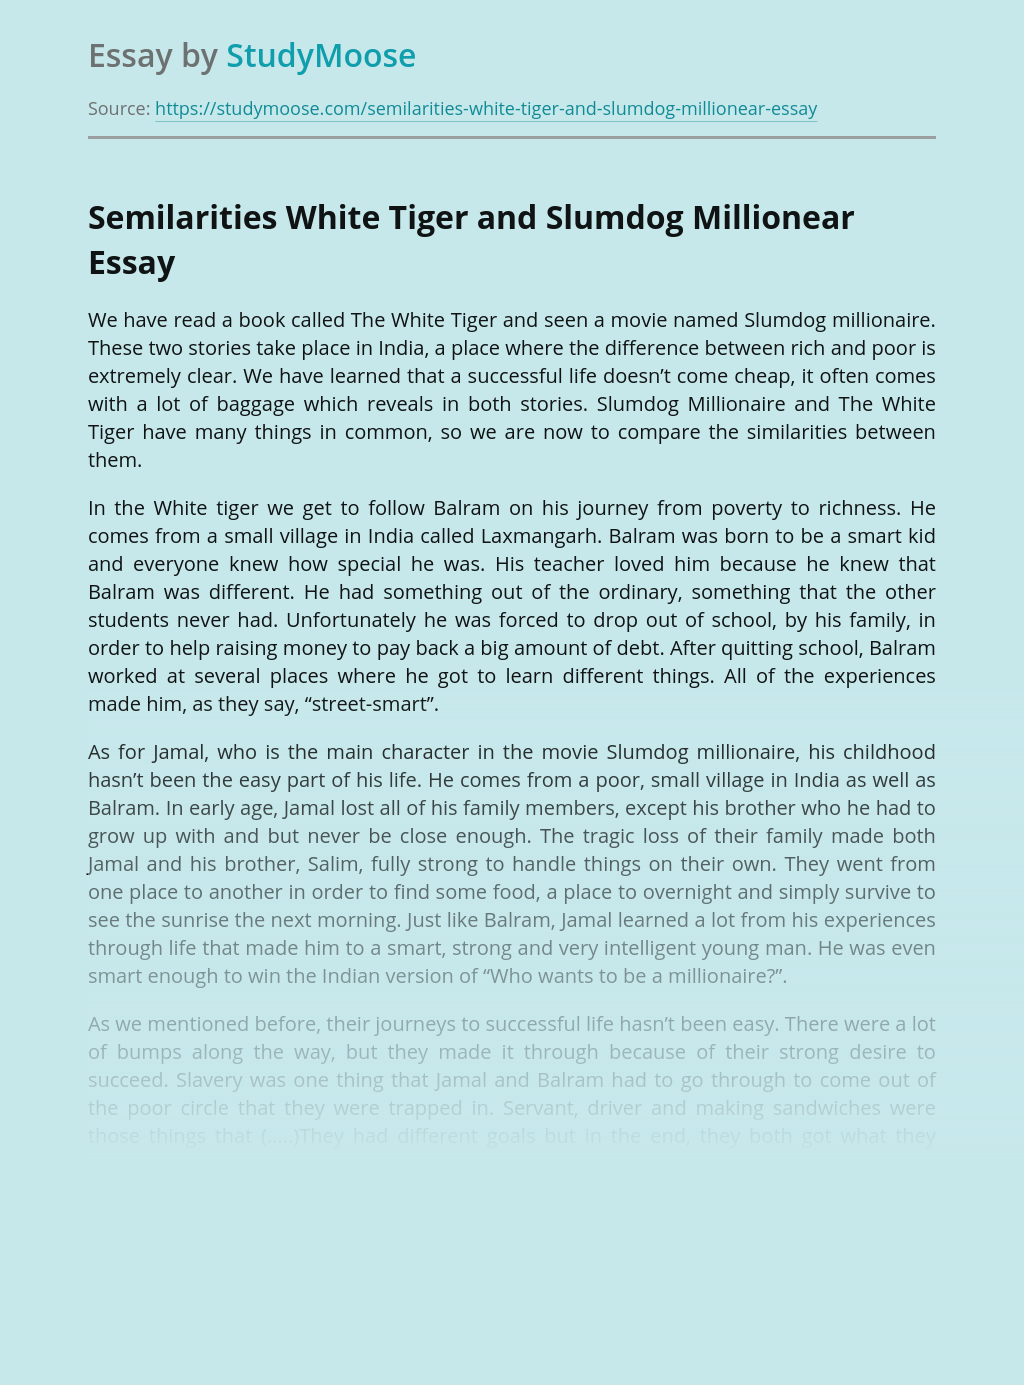 Semilarities White Tiger and Slumdog Millionear